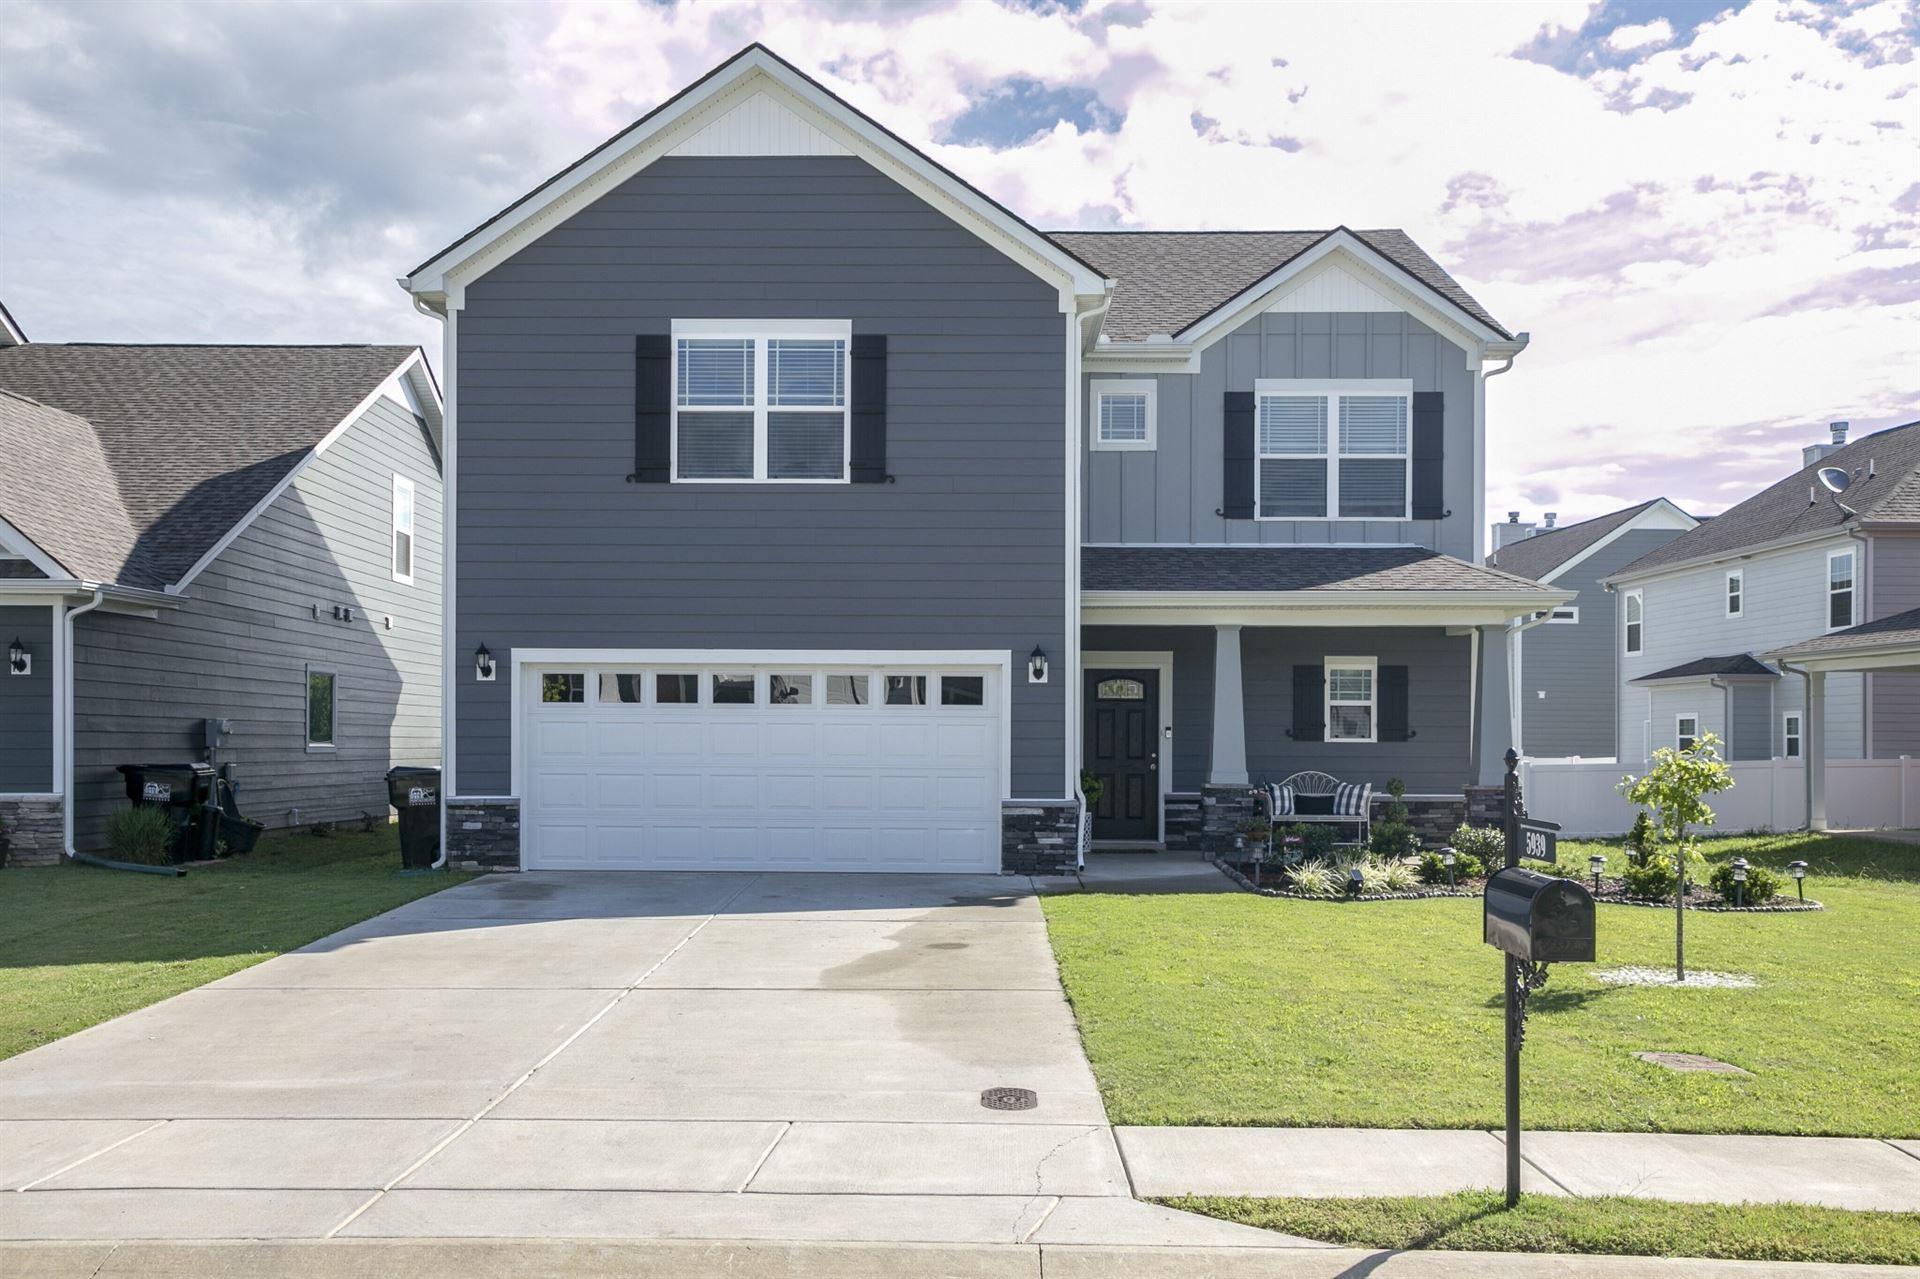 5939 Enclave Dr, Murfreesboro, TN 37128 - MLS#: 2196042